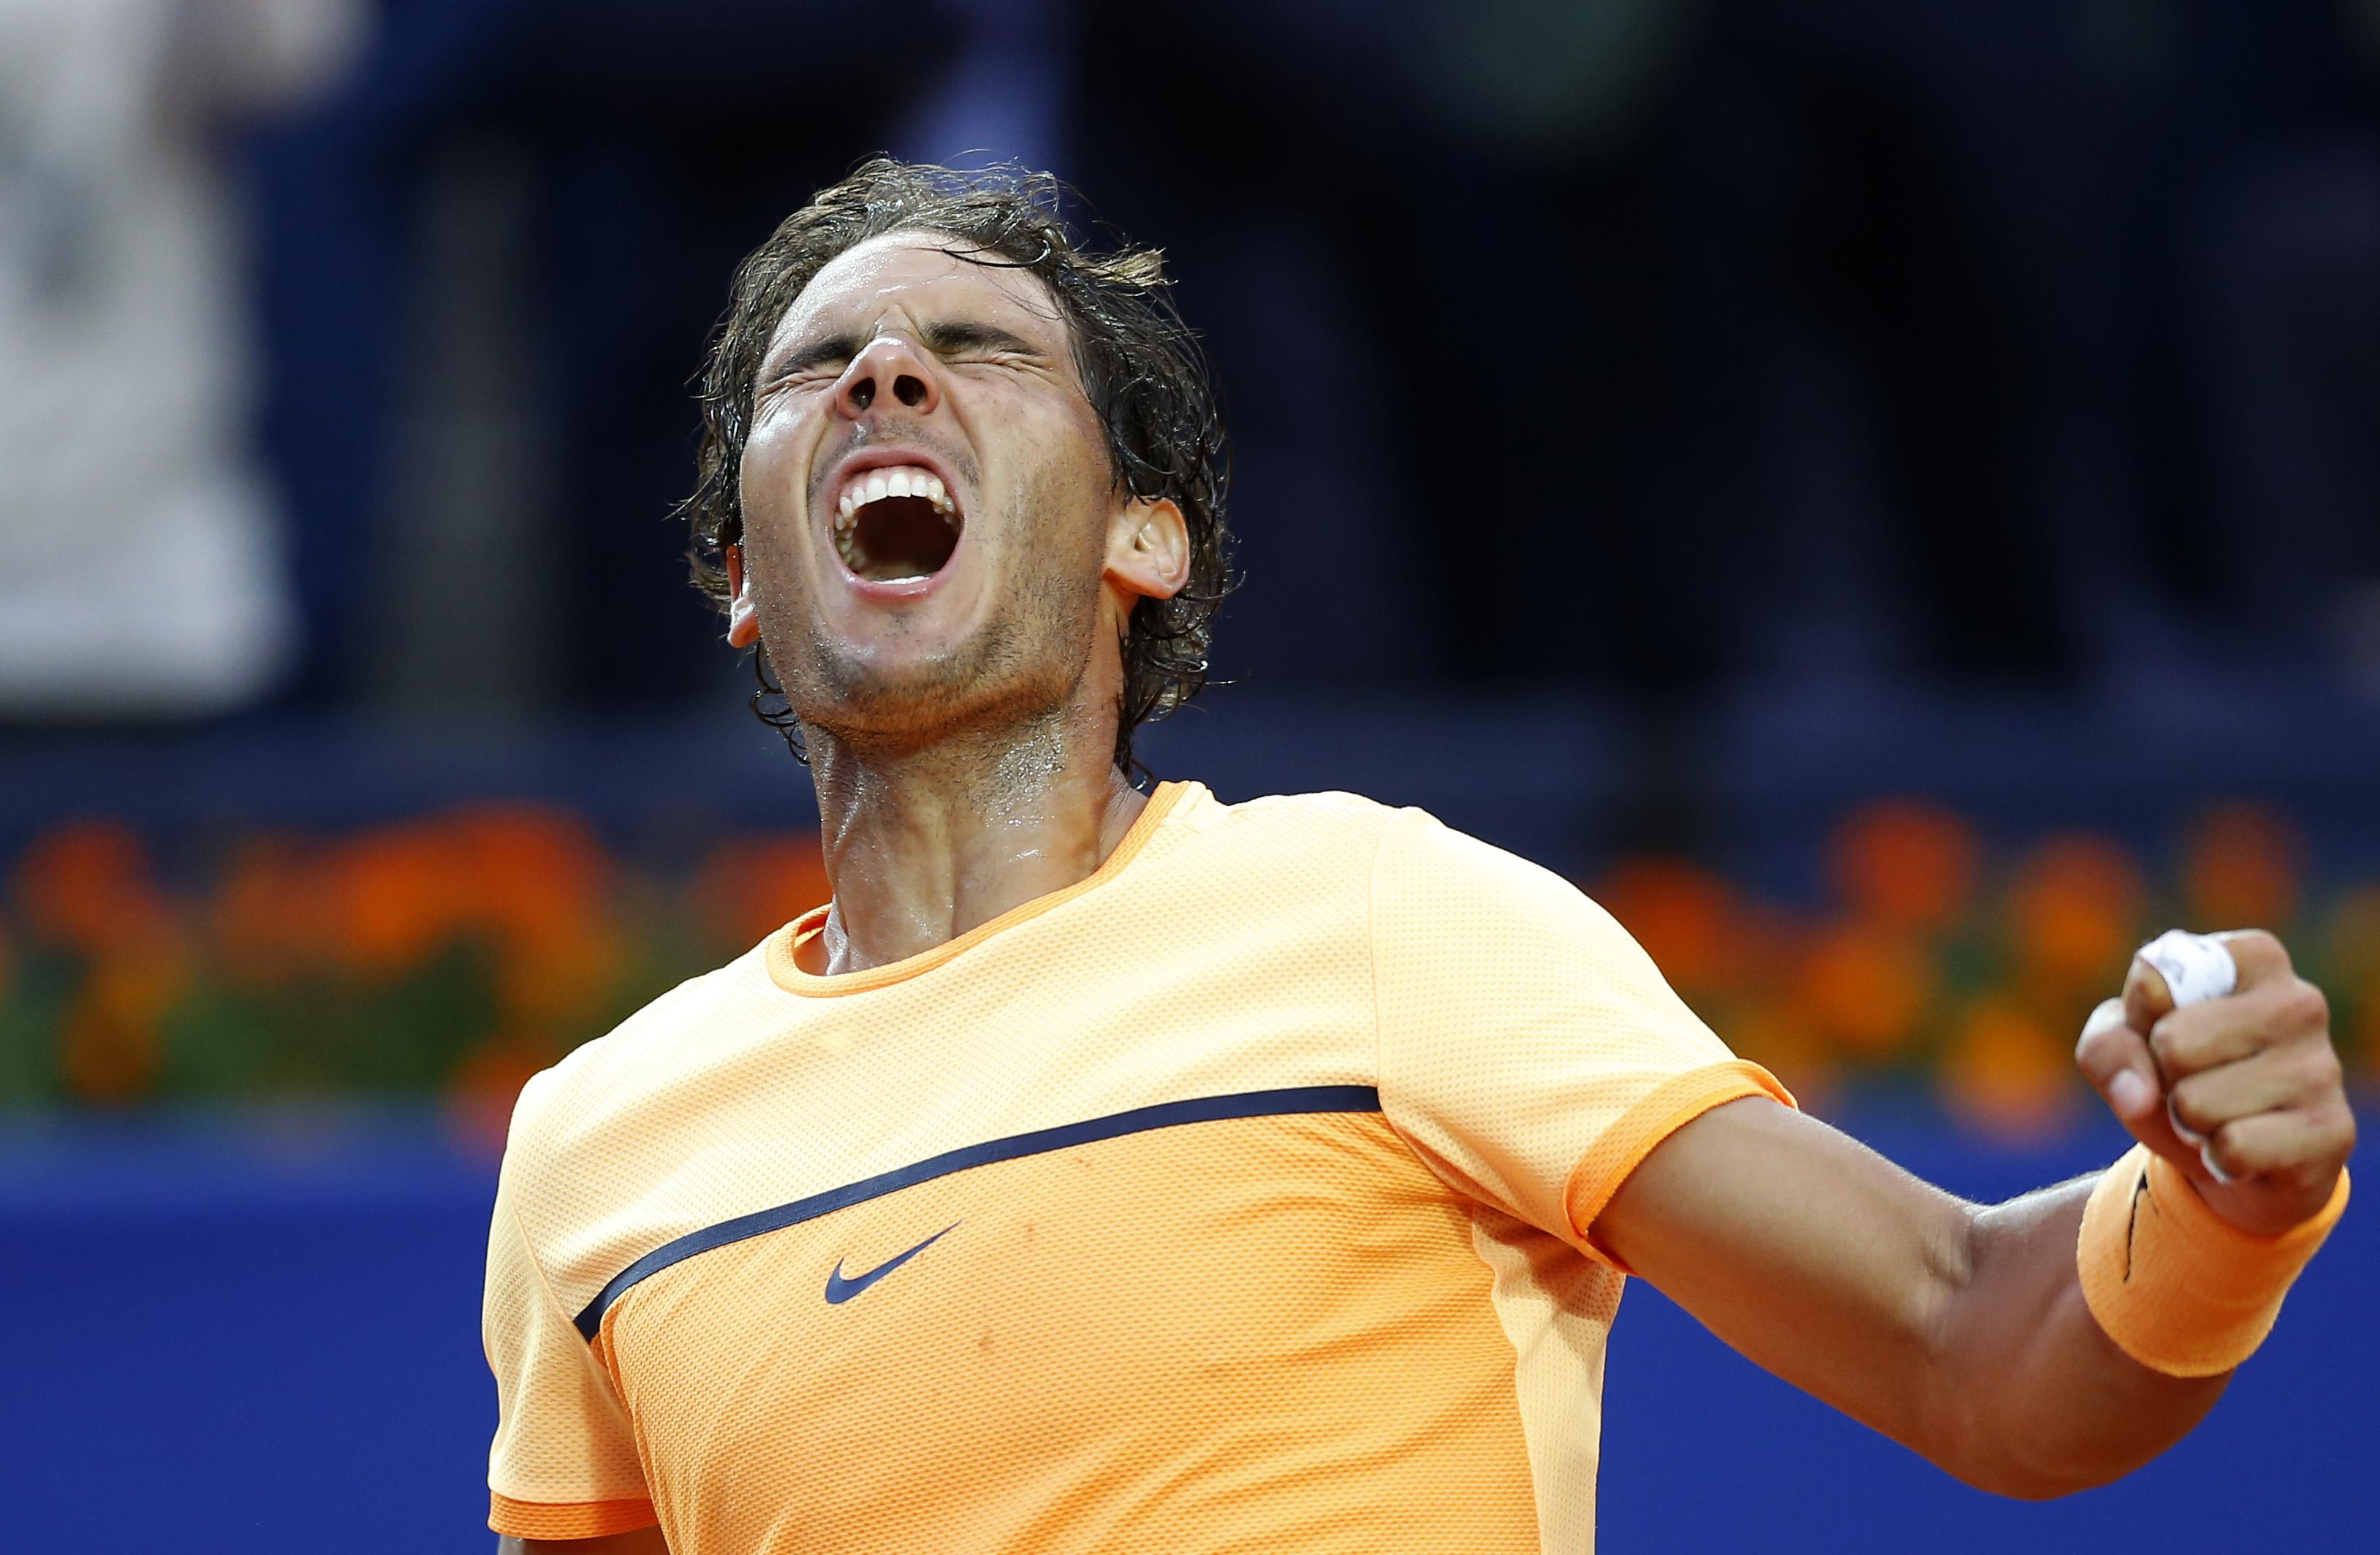 Spain's Rafael Nadal celebrates after winning the Barcelona Open tennis tournament in Barcelona, Spain, Sunday, April 24, 2016. Spain's Rafael Nadal defeated Japans Kei Nishikori 6-4 and 7-5, in the final. (AP Photo/Manu Fernandez)